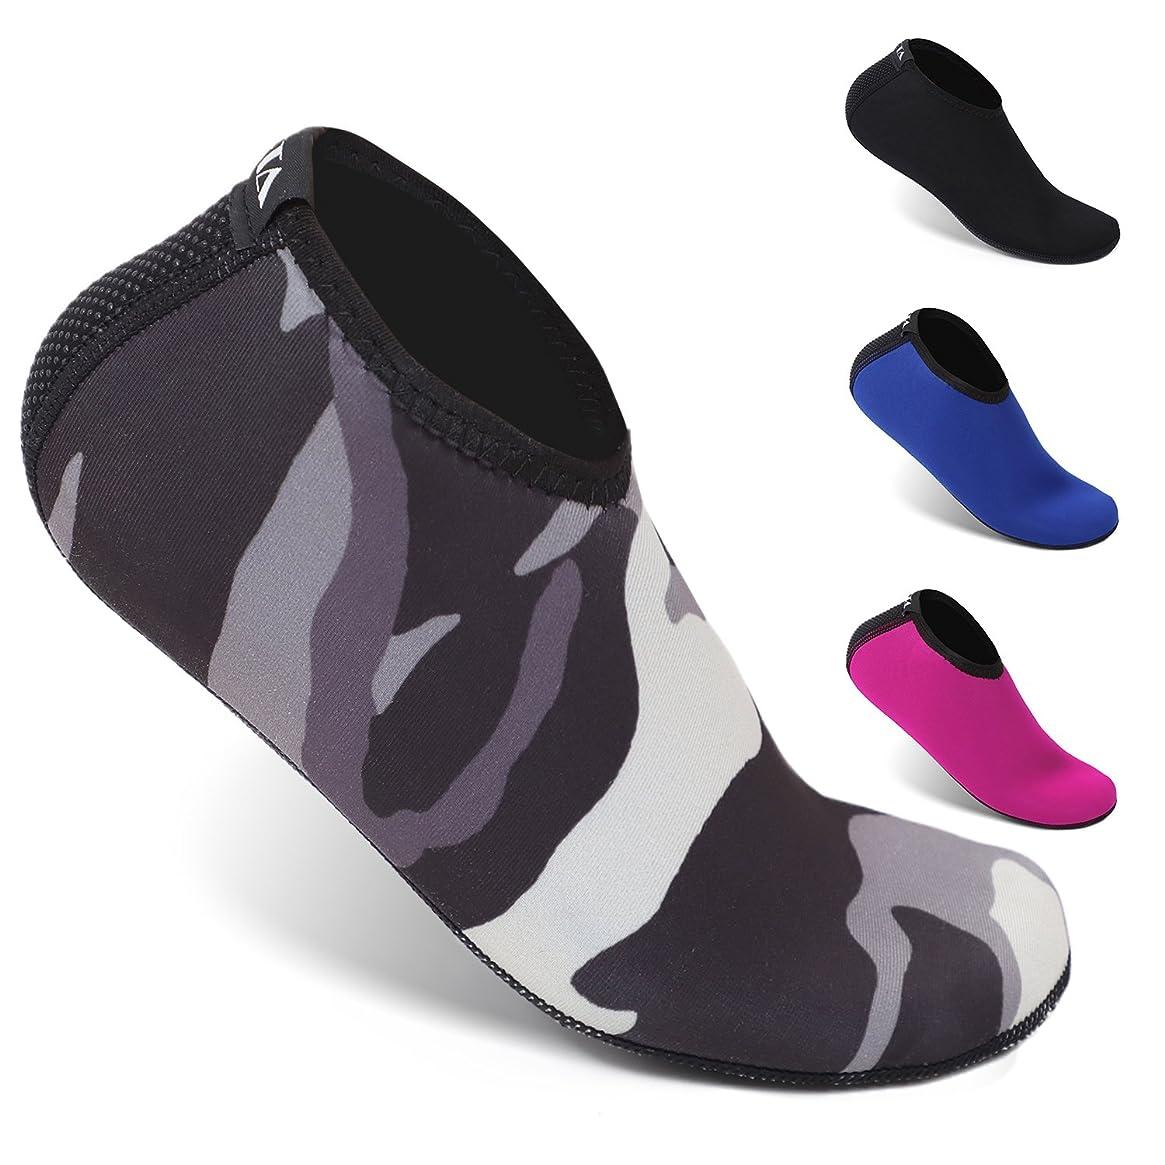 HEETA Neoprene Water Socks for Women Men Professional Water Shoes Quick Dry Aqua Socks for Diving, Snorkeling, Swimming